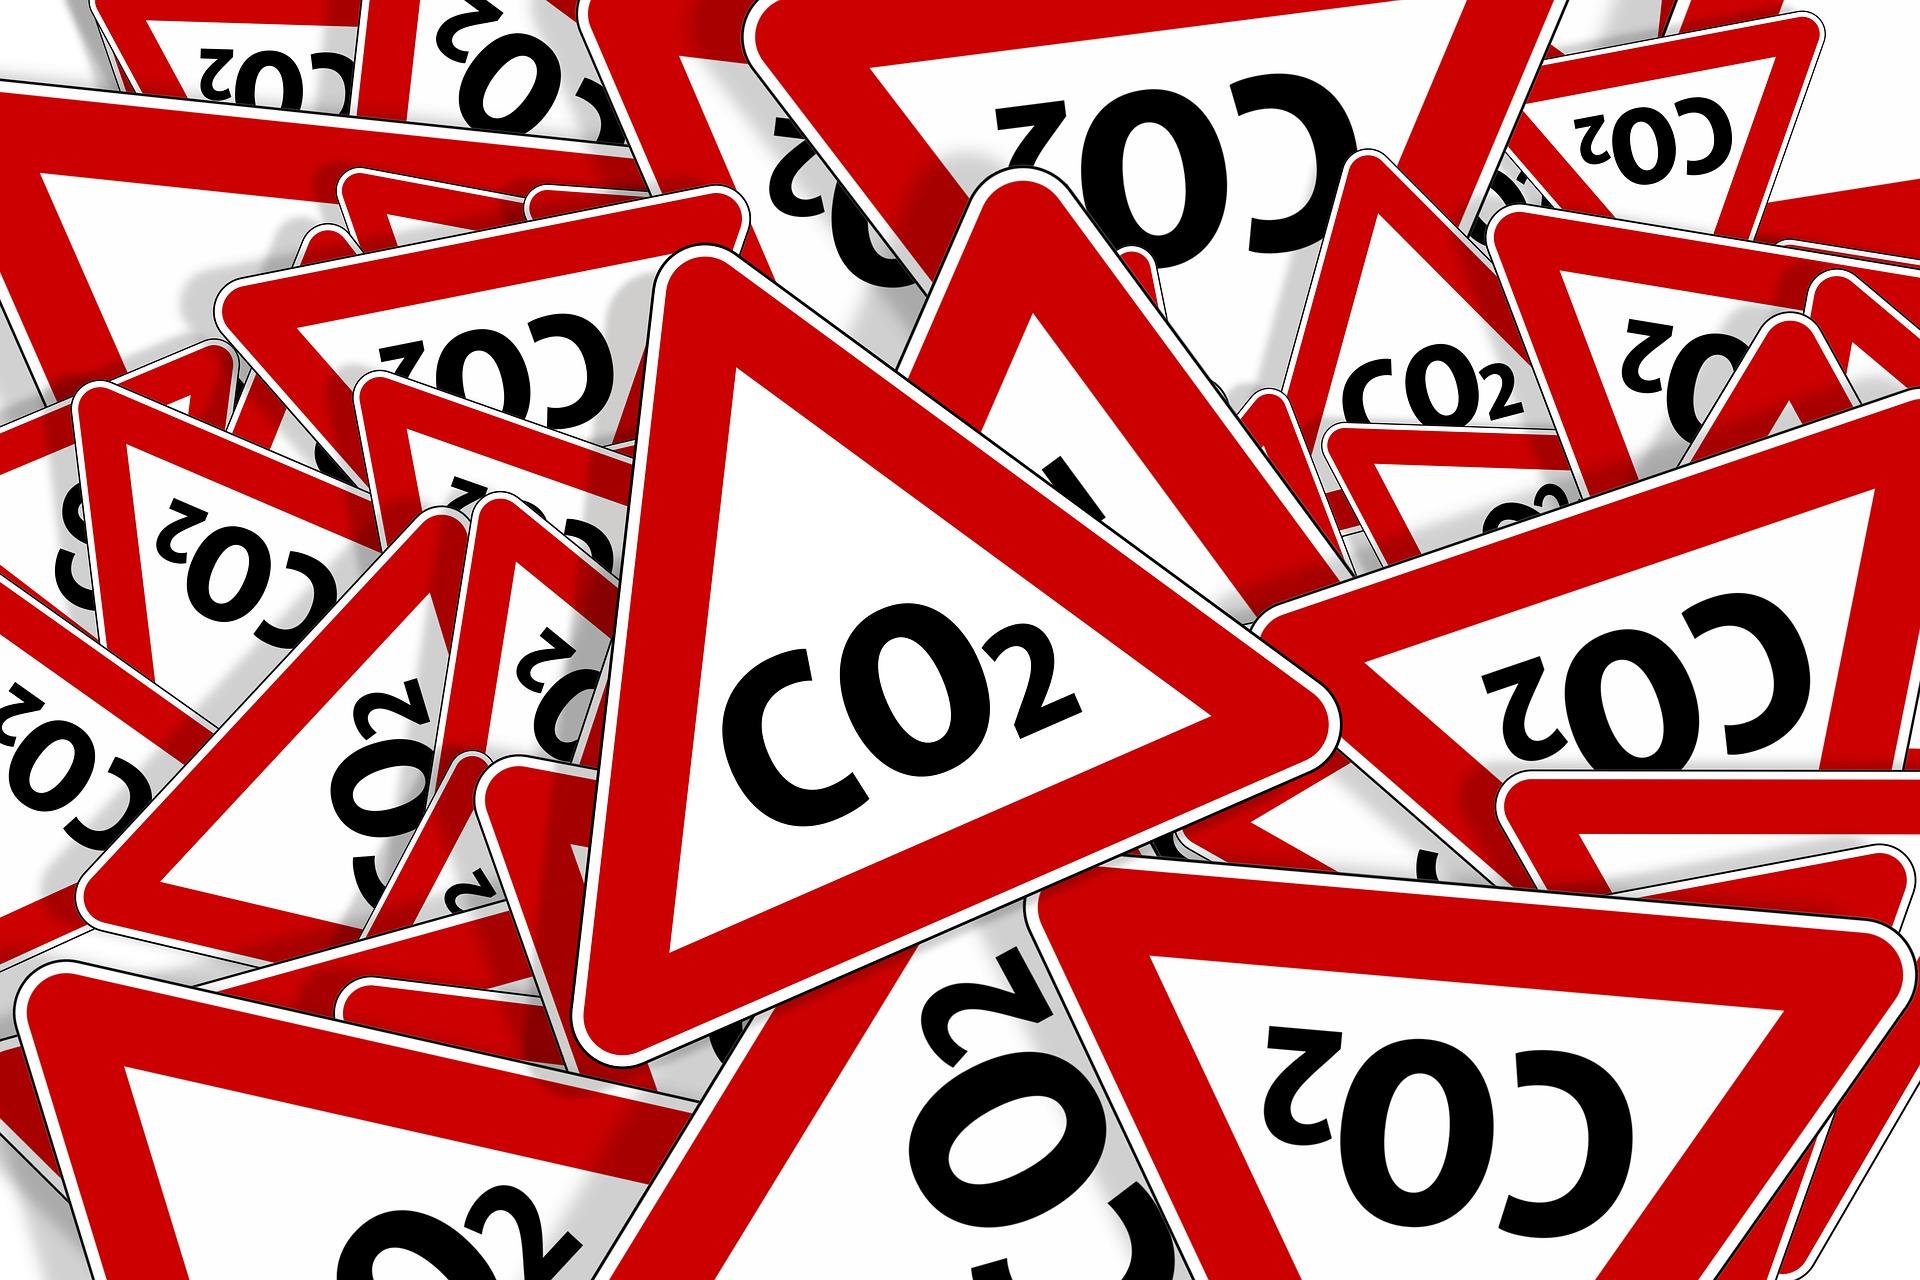 Vorrangtafeln CO2